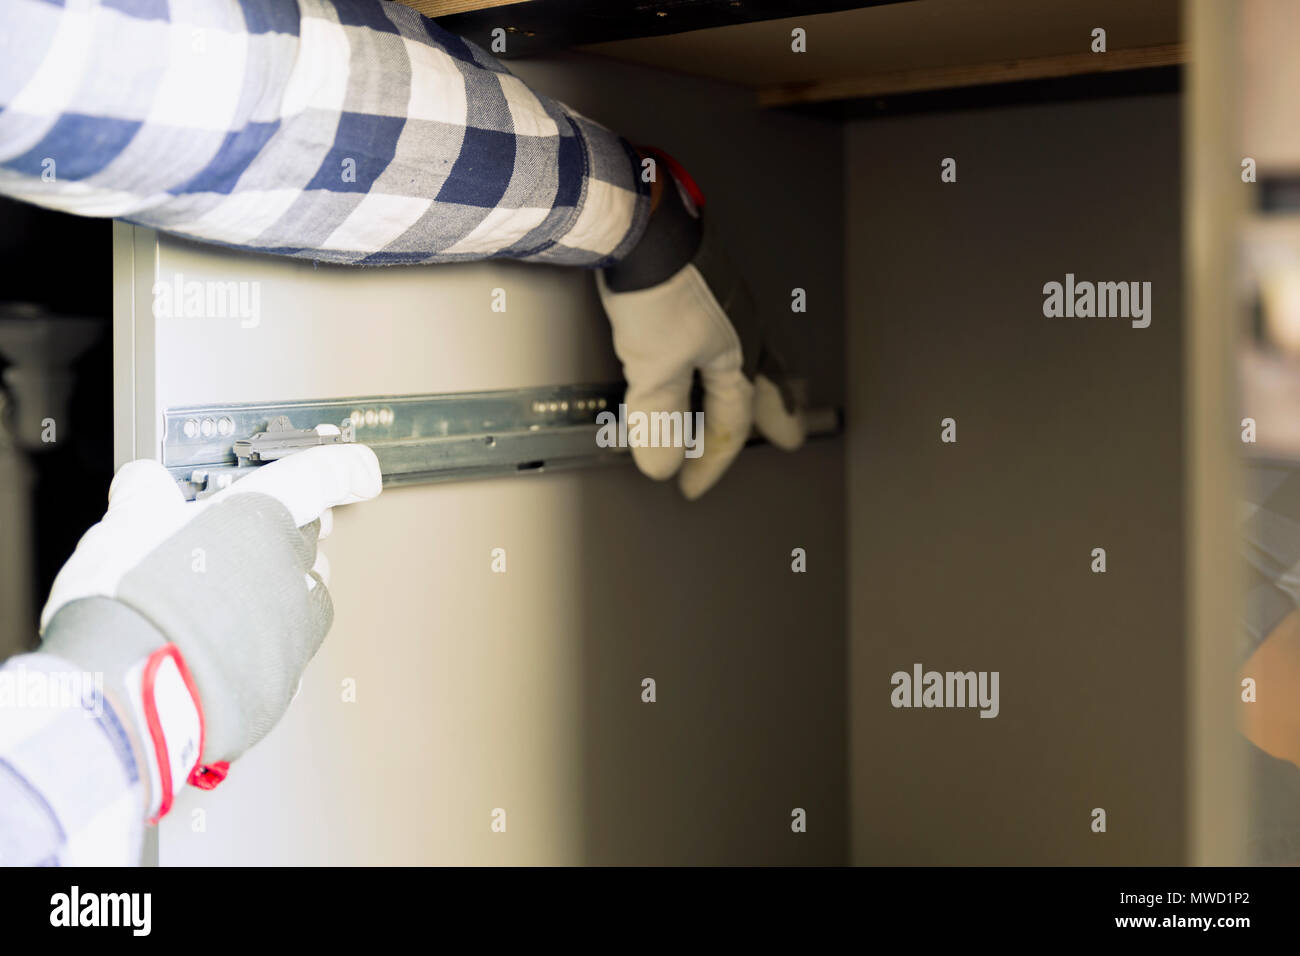 Remodeling Kitchen Stockfotos & Remodeling Kitchen Bilder - Alamy